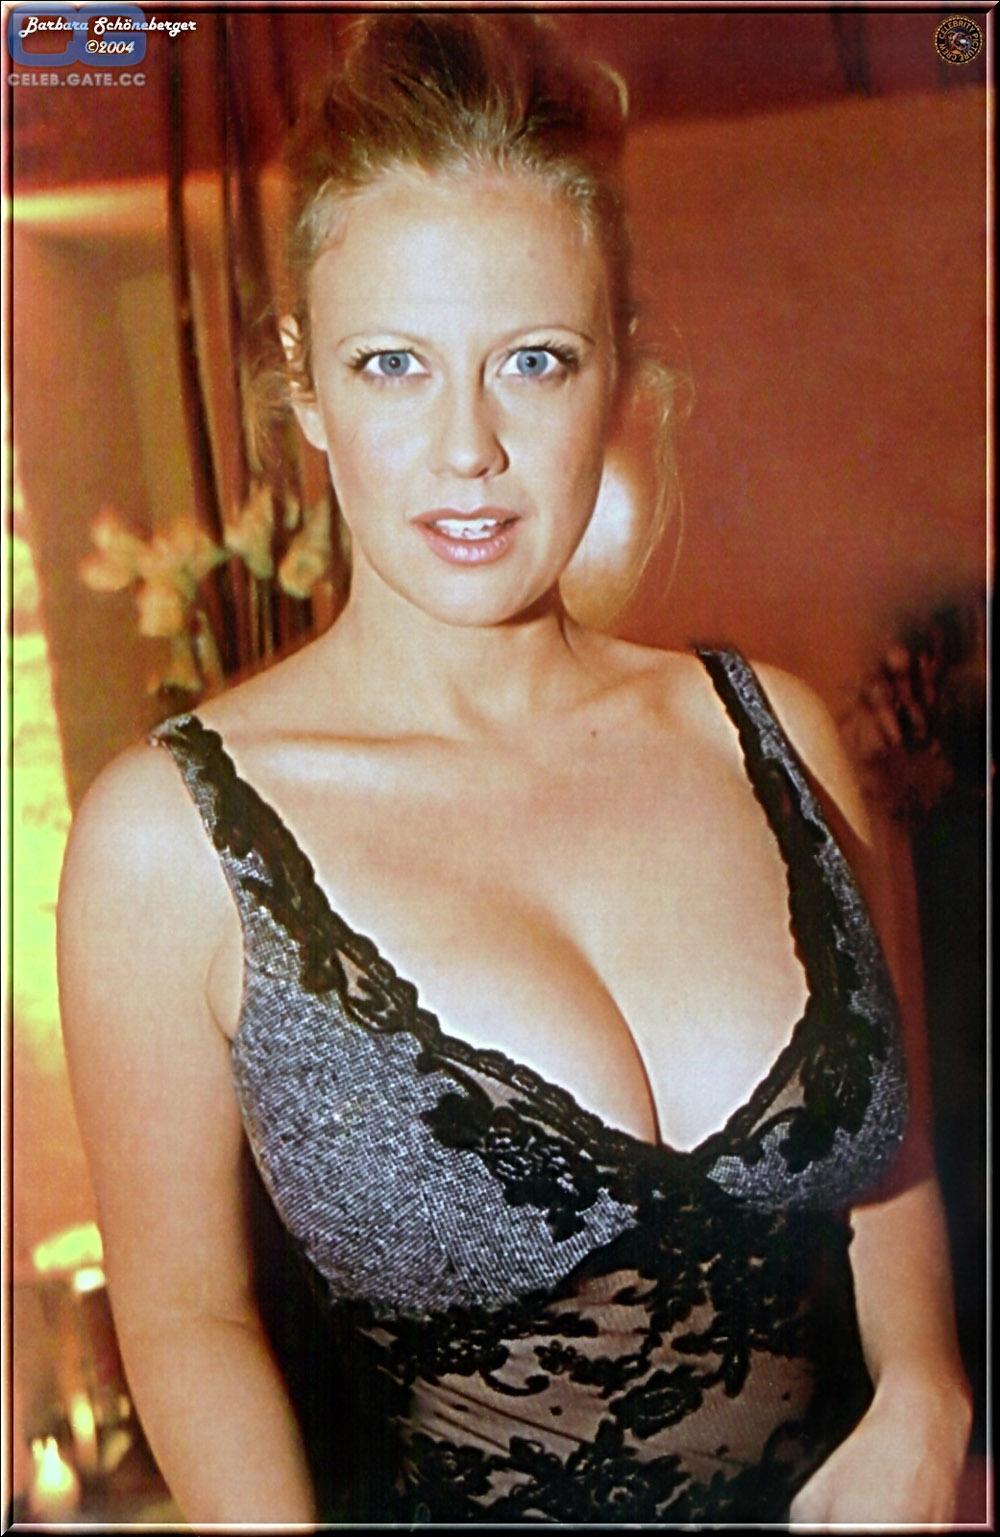 Porno barbara schöneberger Barbara Schoeneberger